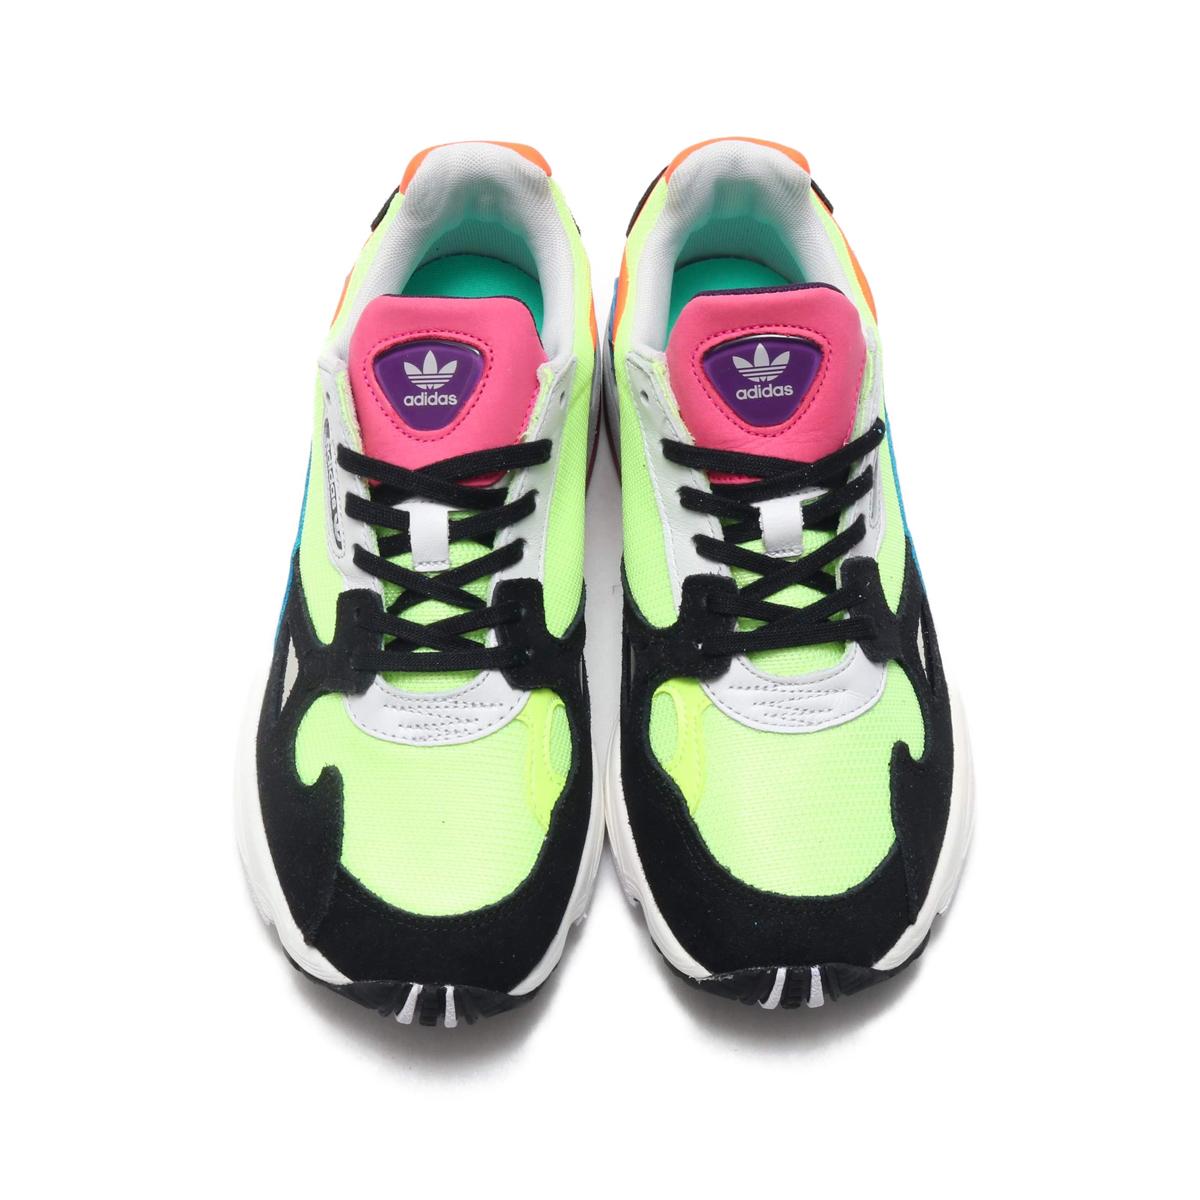 reputable site 7ddbb 074db adidas Originals ADIDASFALCON W (HI-RES YELLOW HI-RES YELLOW CORE BLACK) (Adidas  originals Adidas falcon W)